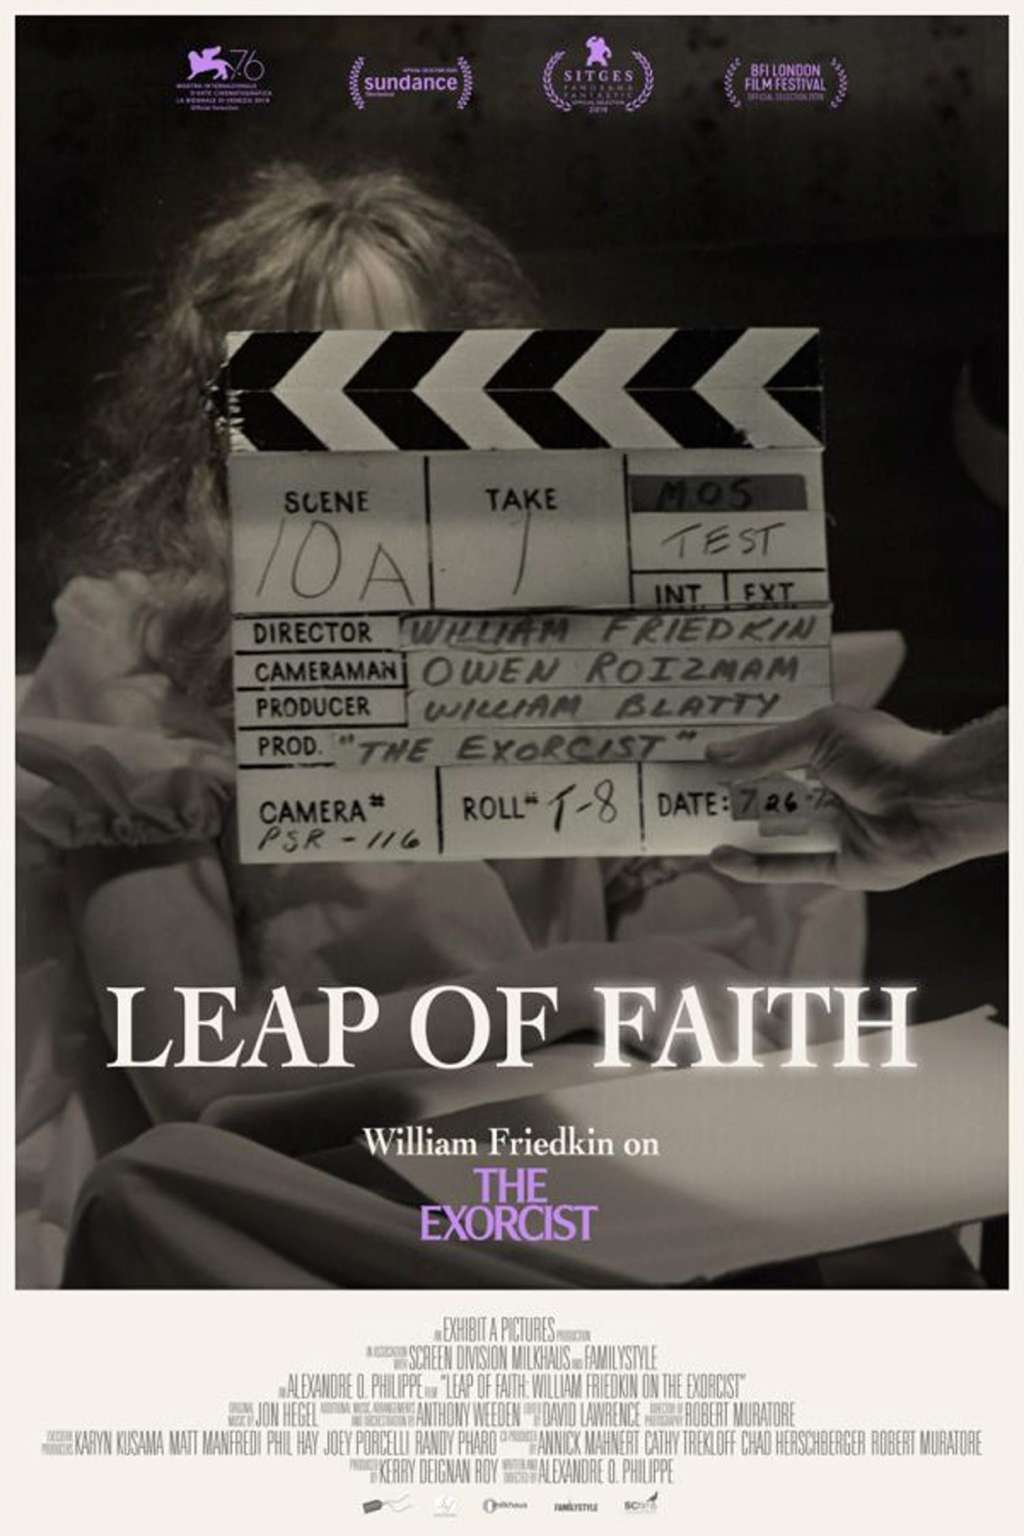 Leap of Faith: William Friedkin on the Exorcist kapak